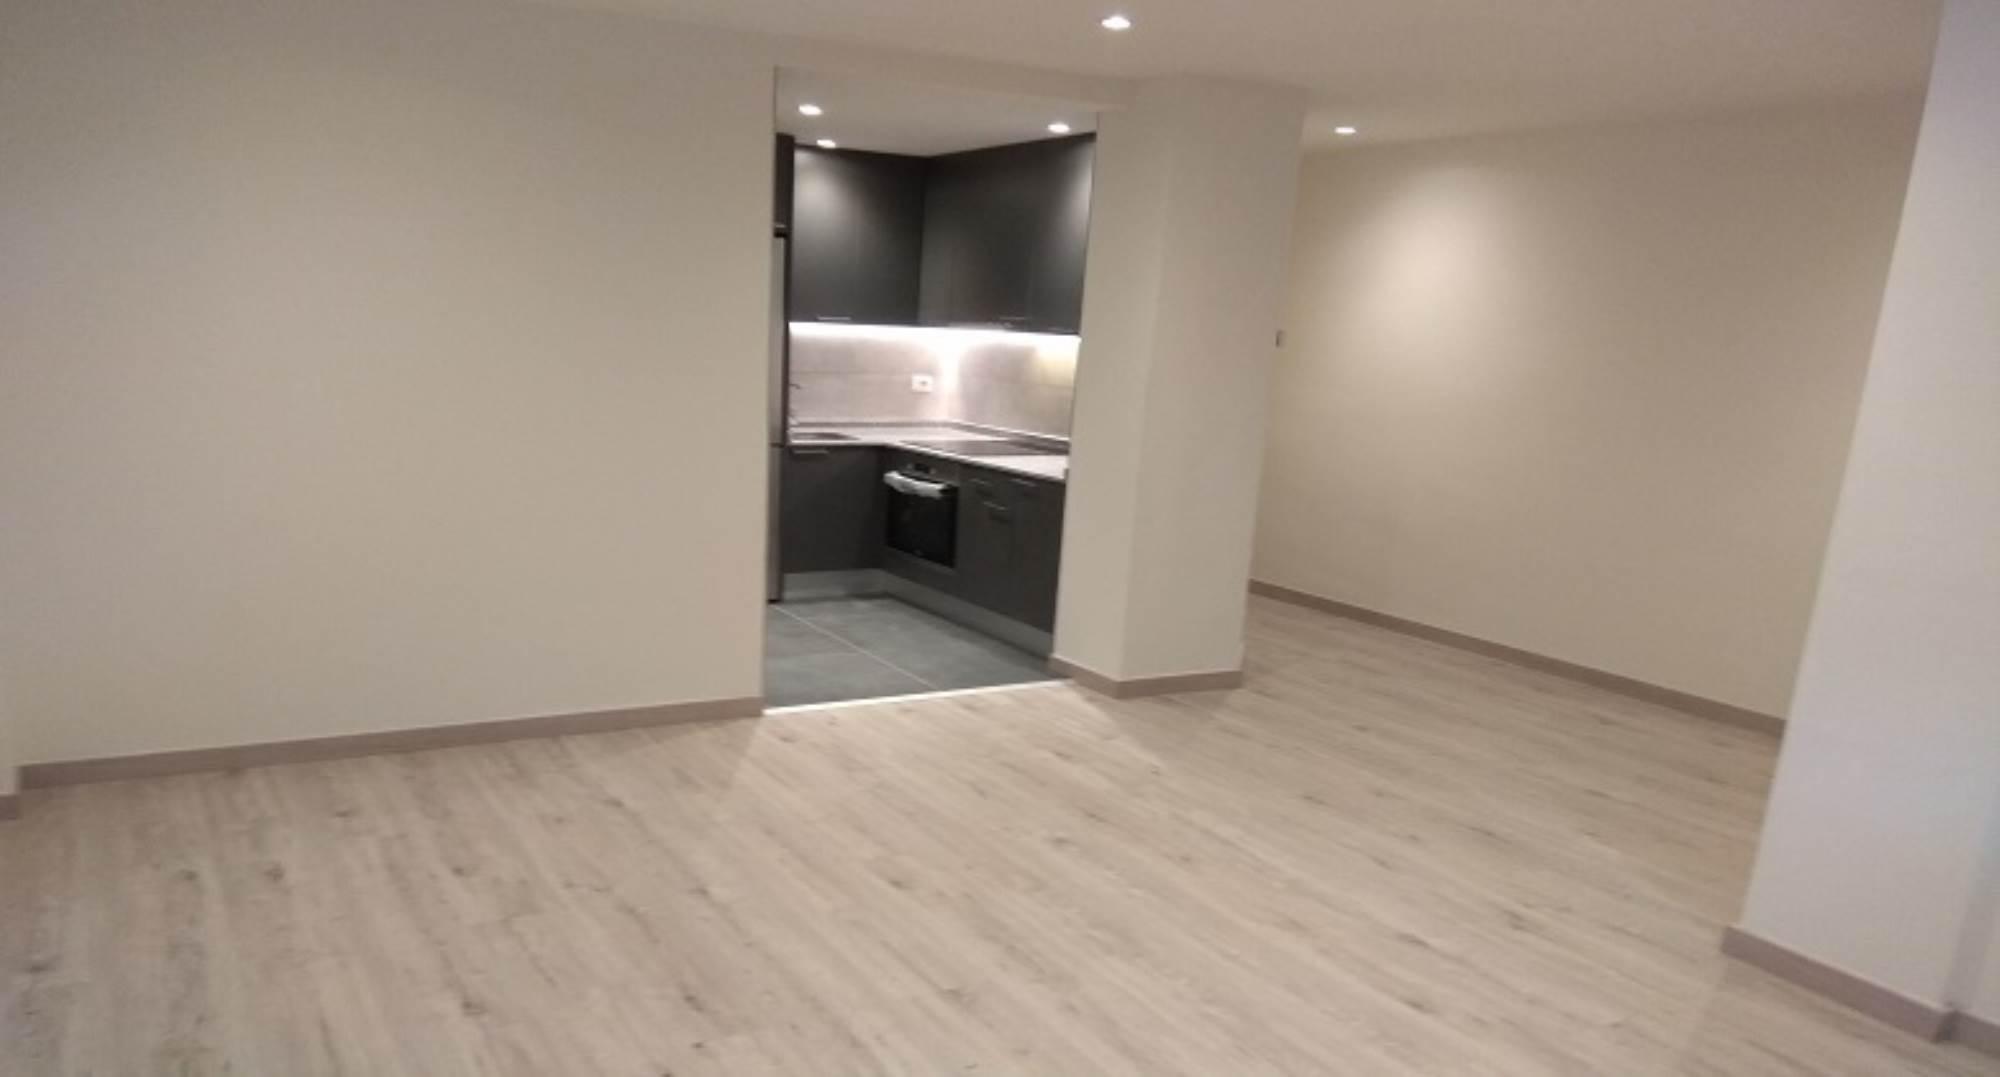 Habitatge semi-nou